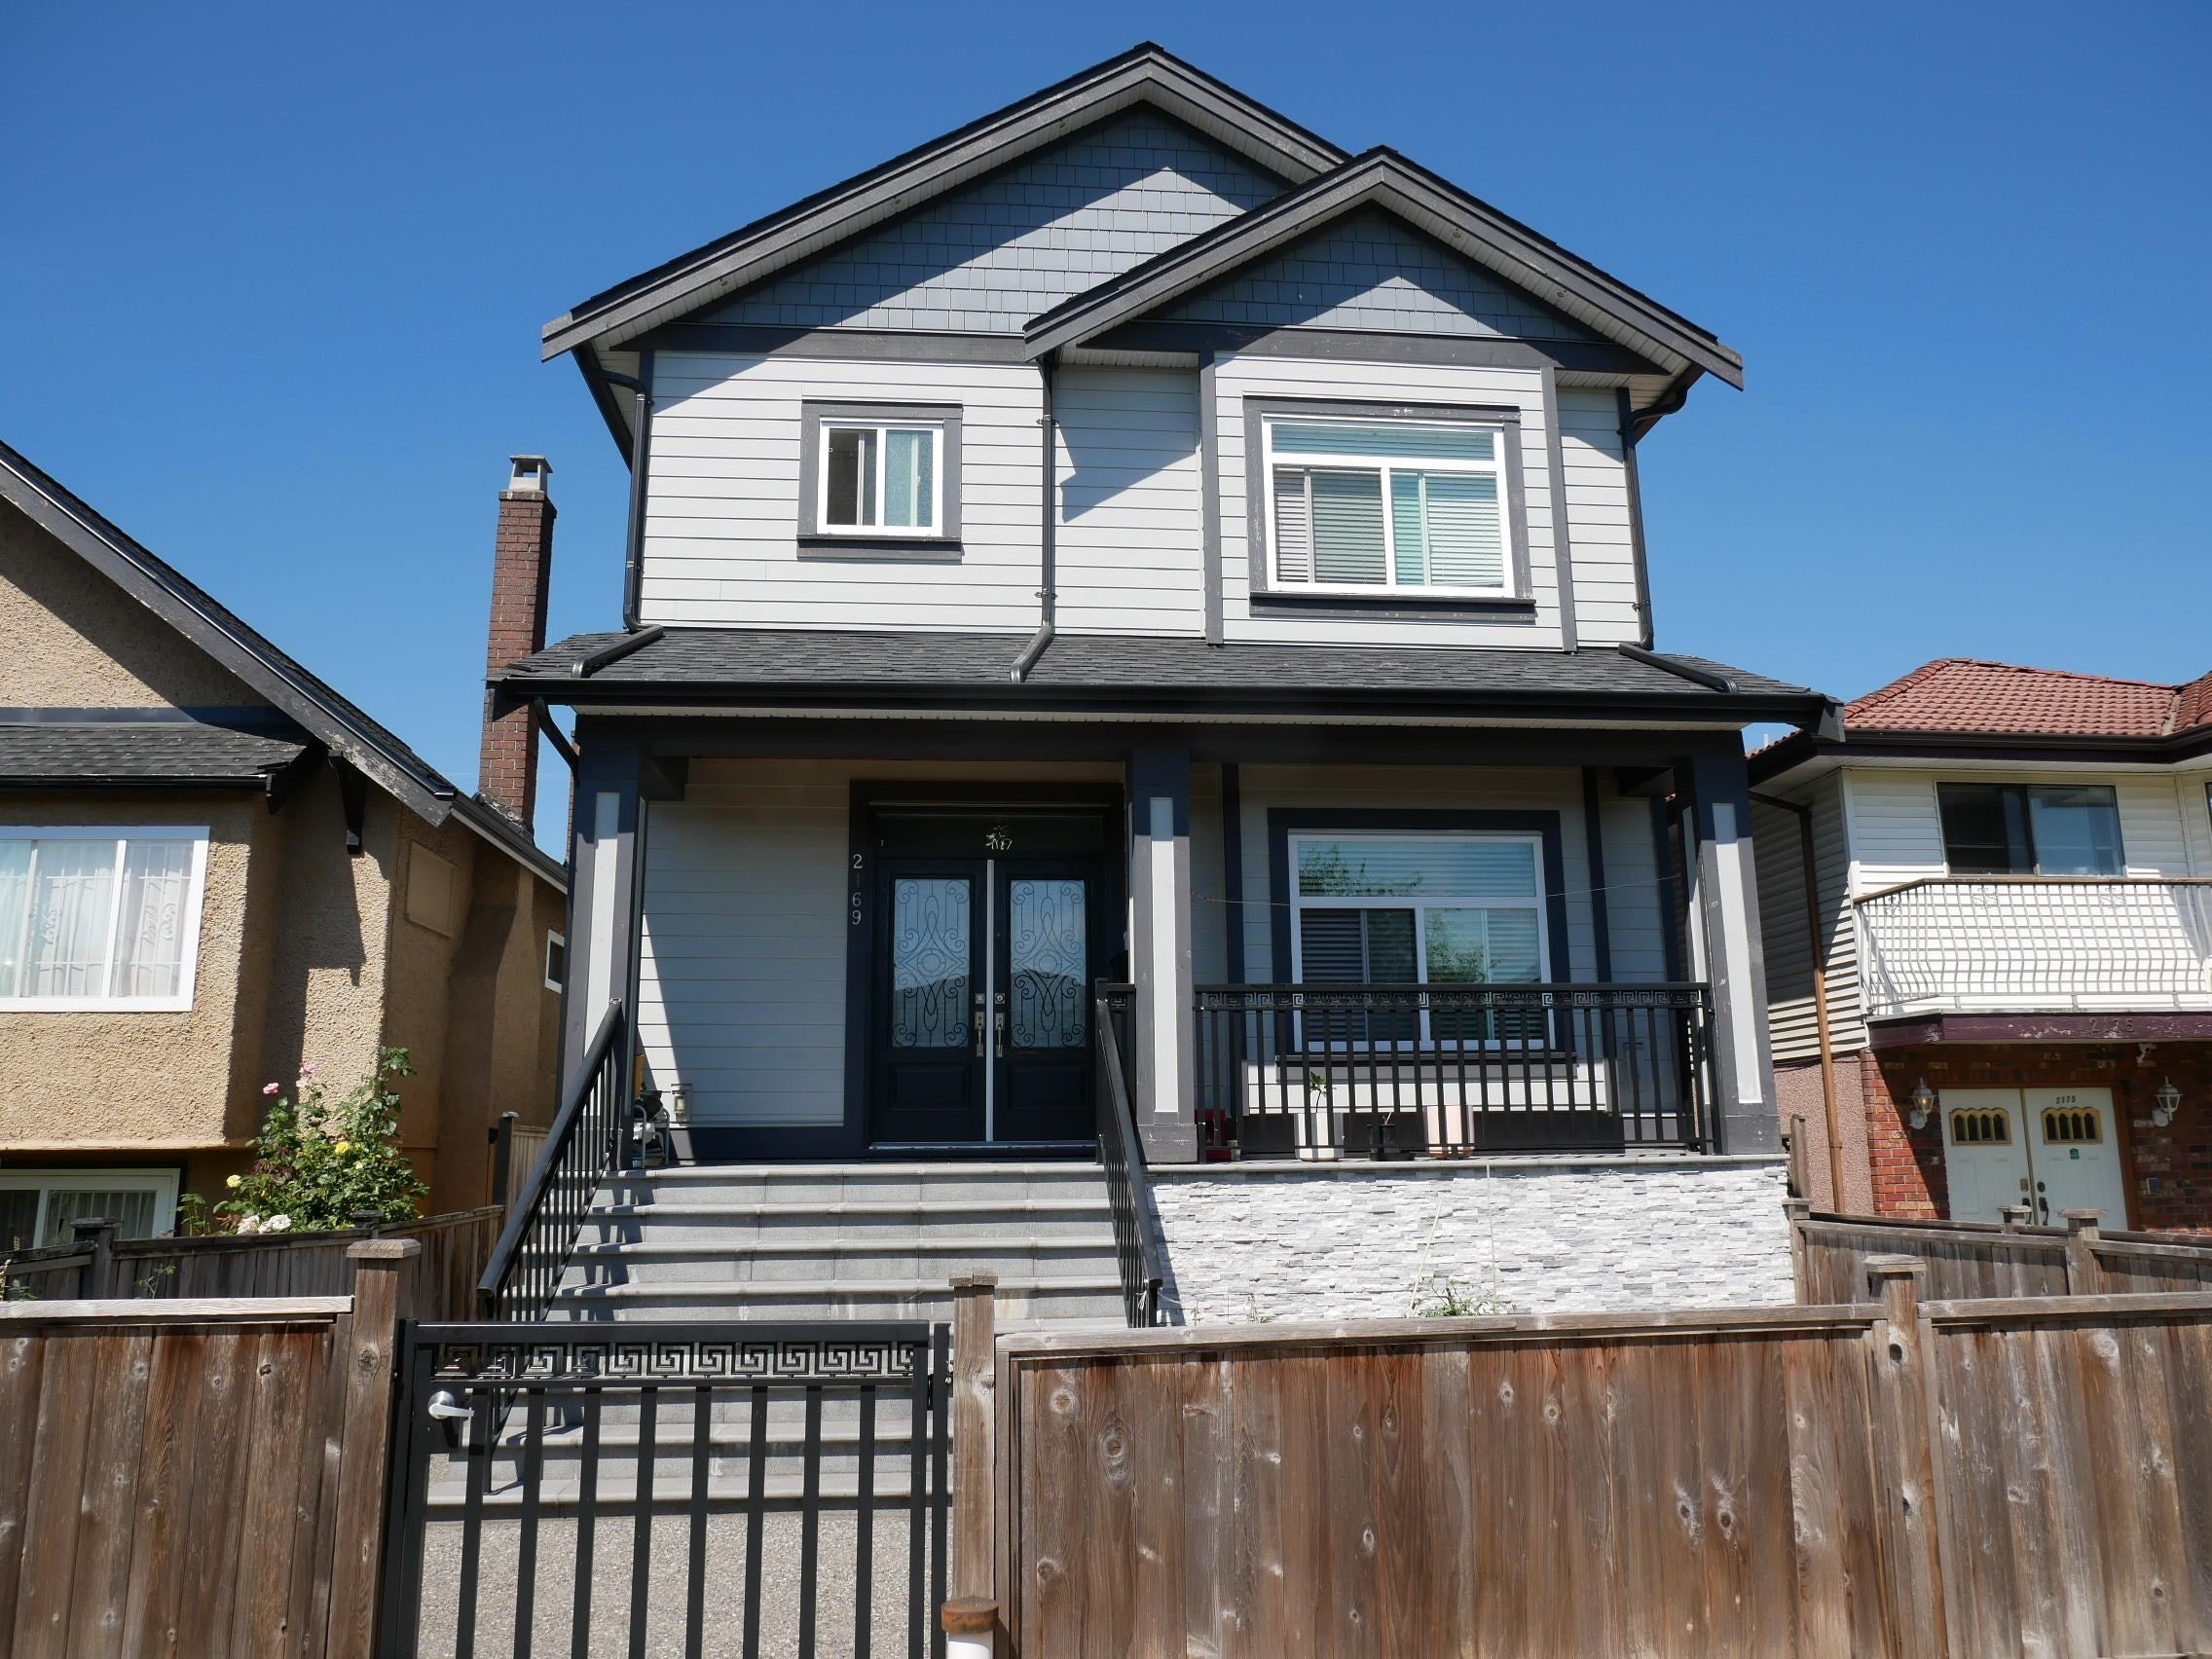 2169 MANNERING AVENUE - Victoria VE 1/2 Duplex for sale, 3 Bedrooms (R2610507) - #1